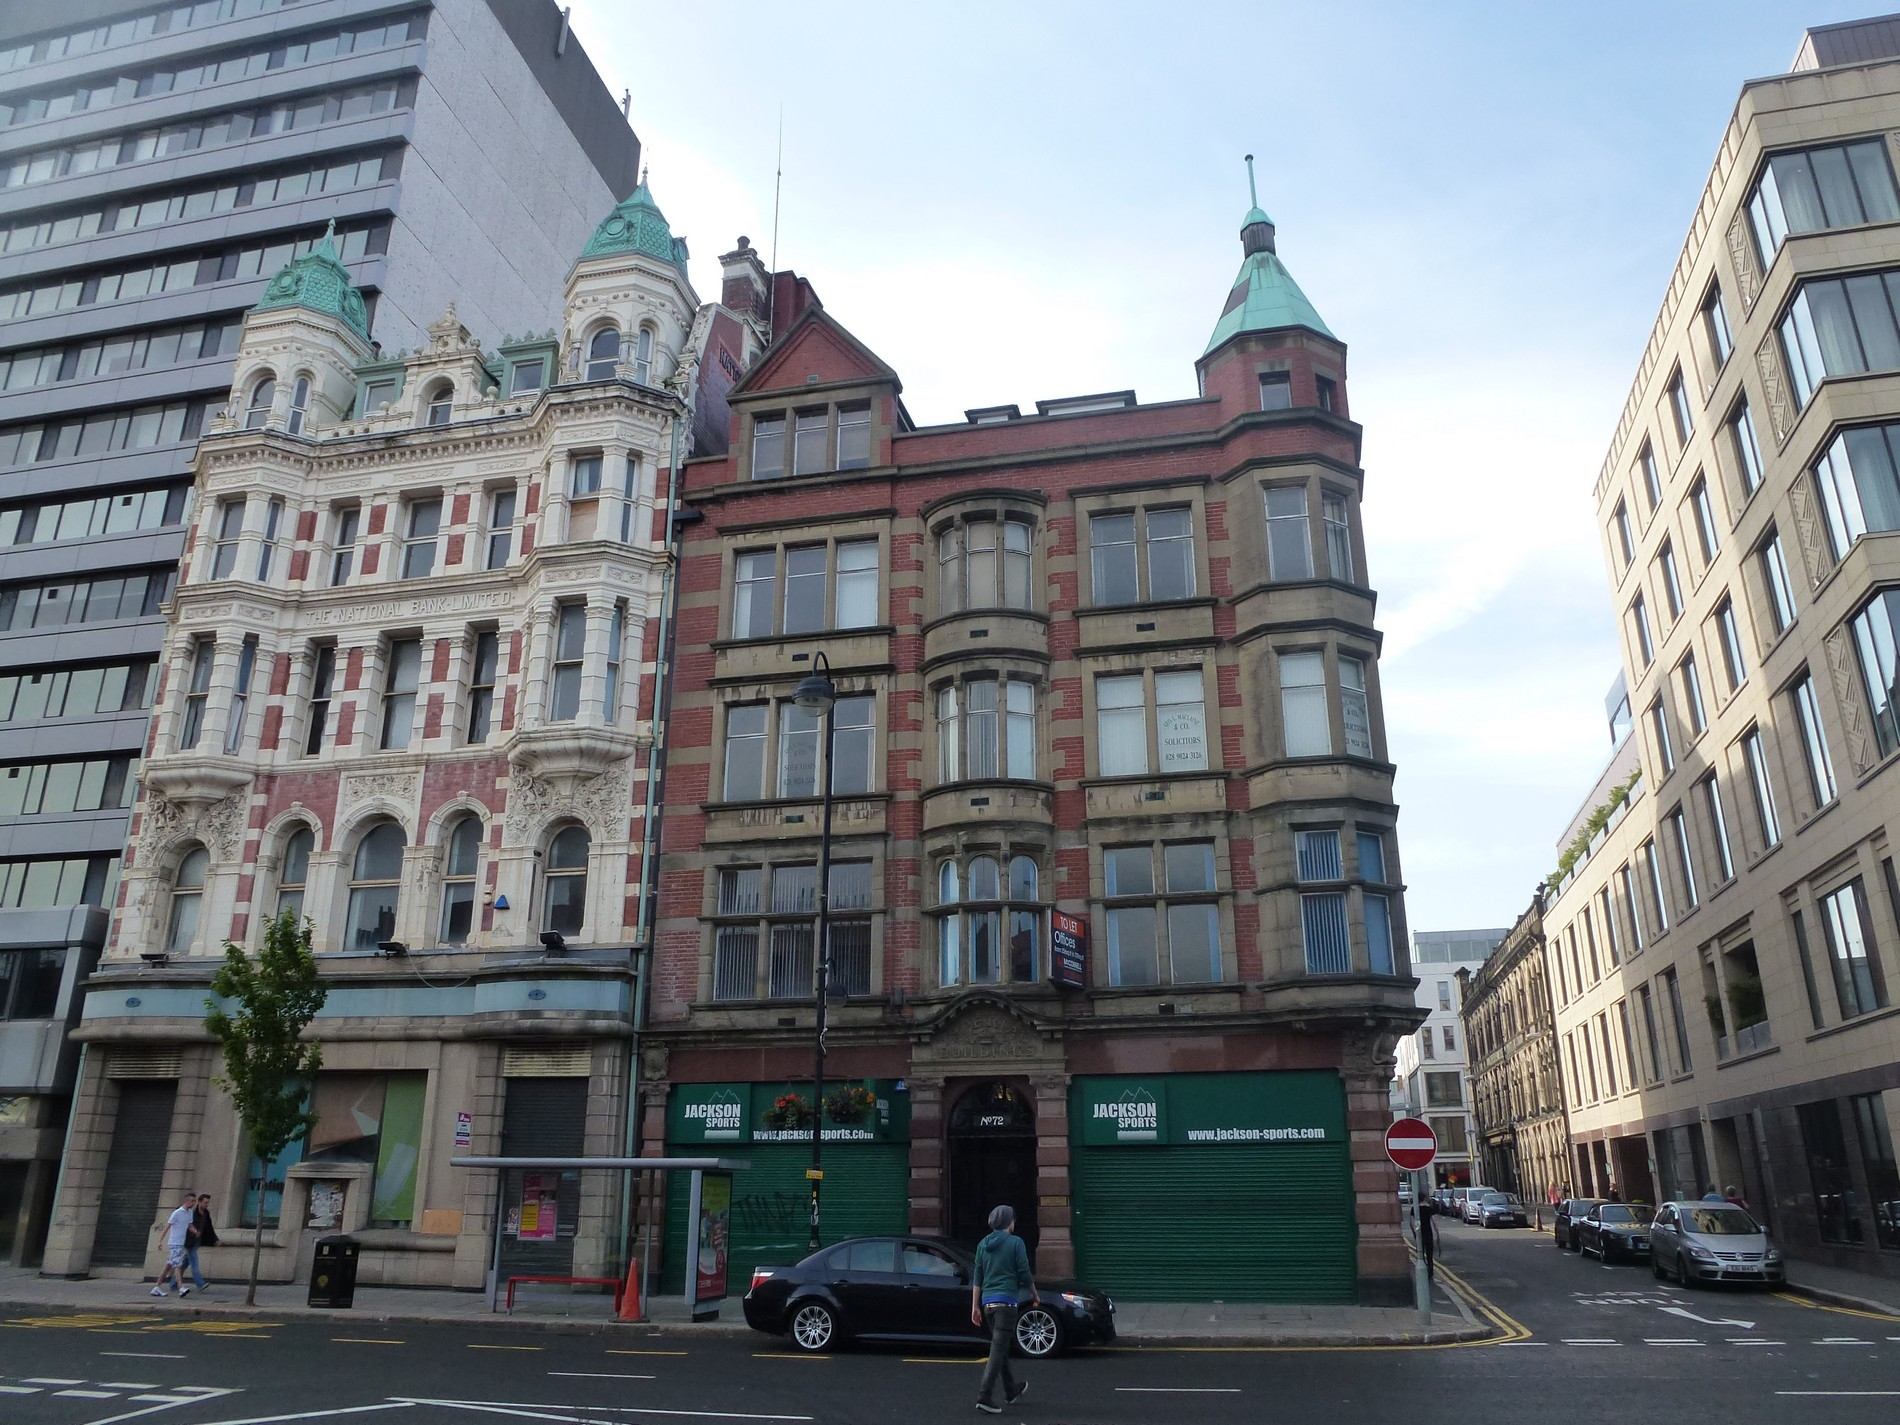 Visiter belfast en irlande du nord tourisme voyage for Architecture victorienne